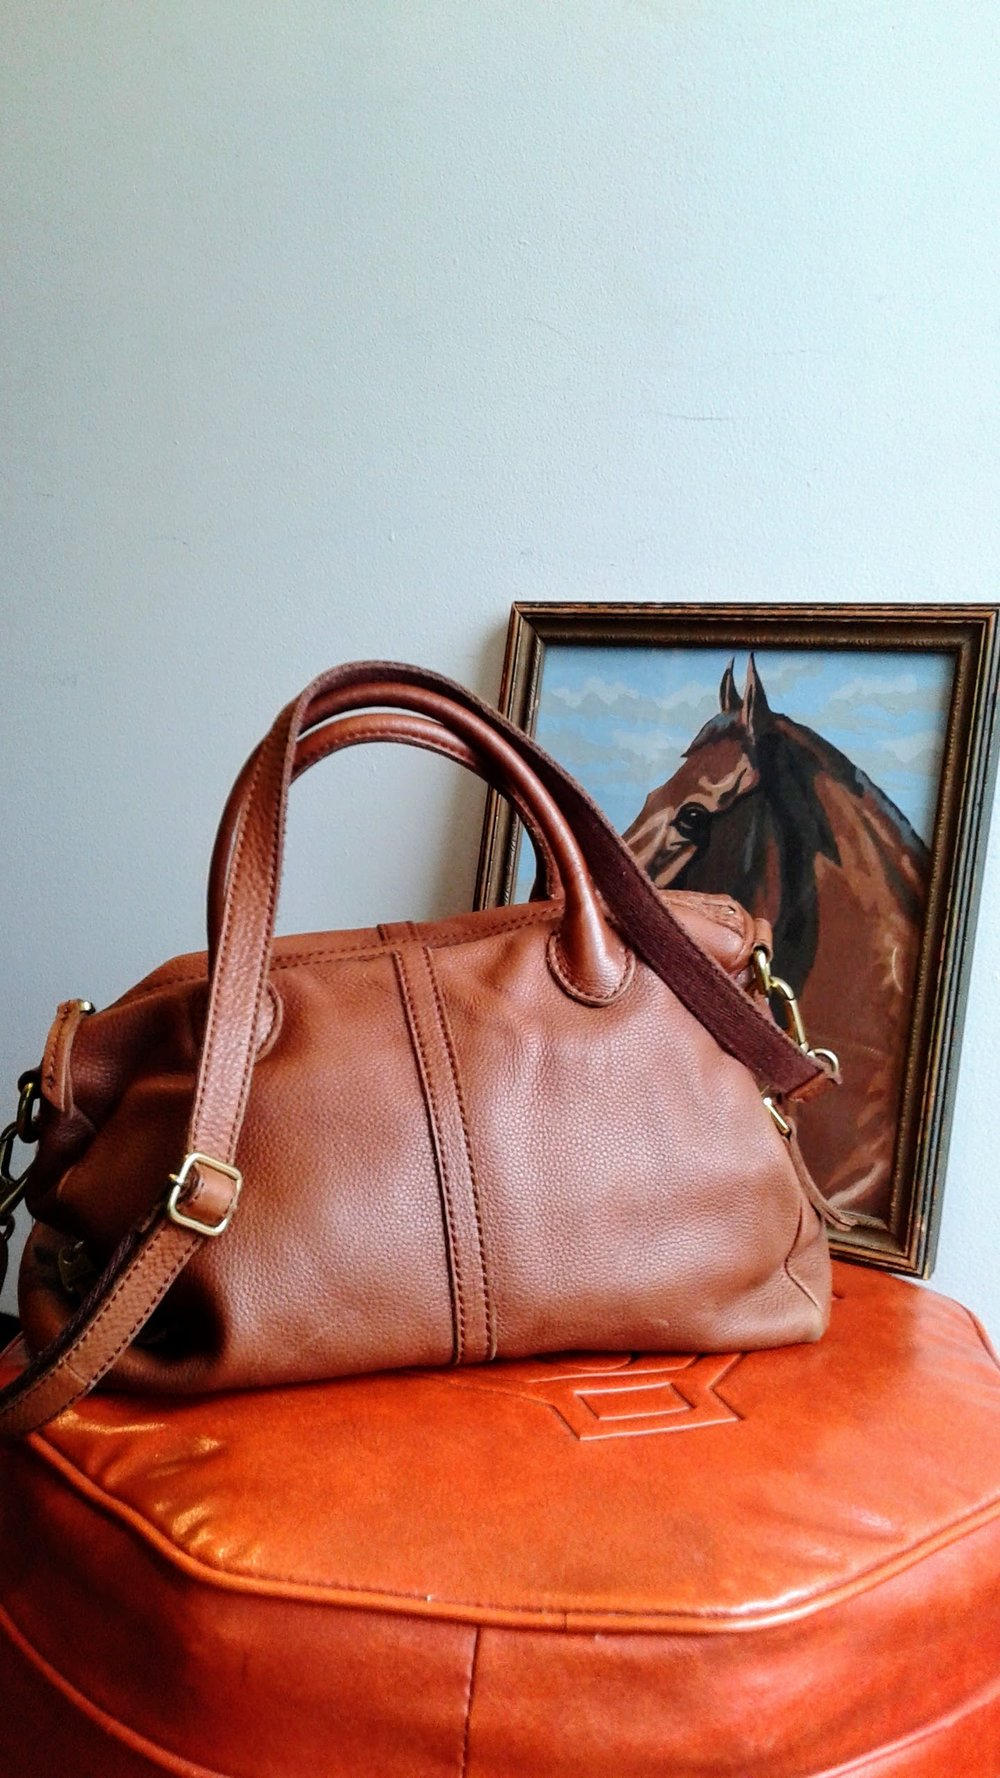 Fossil purse, $72